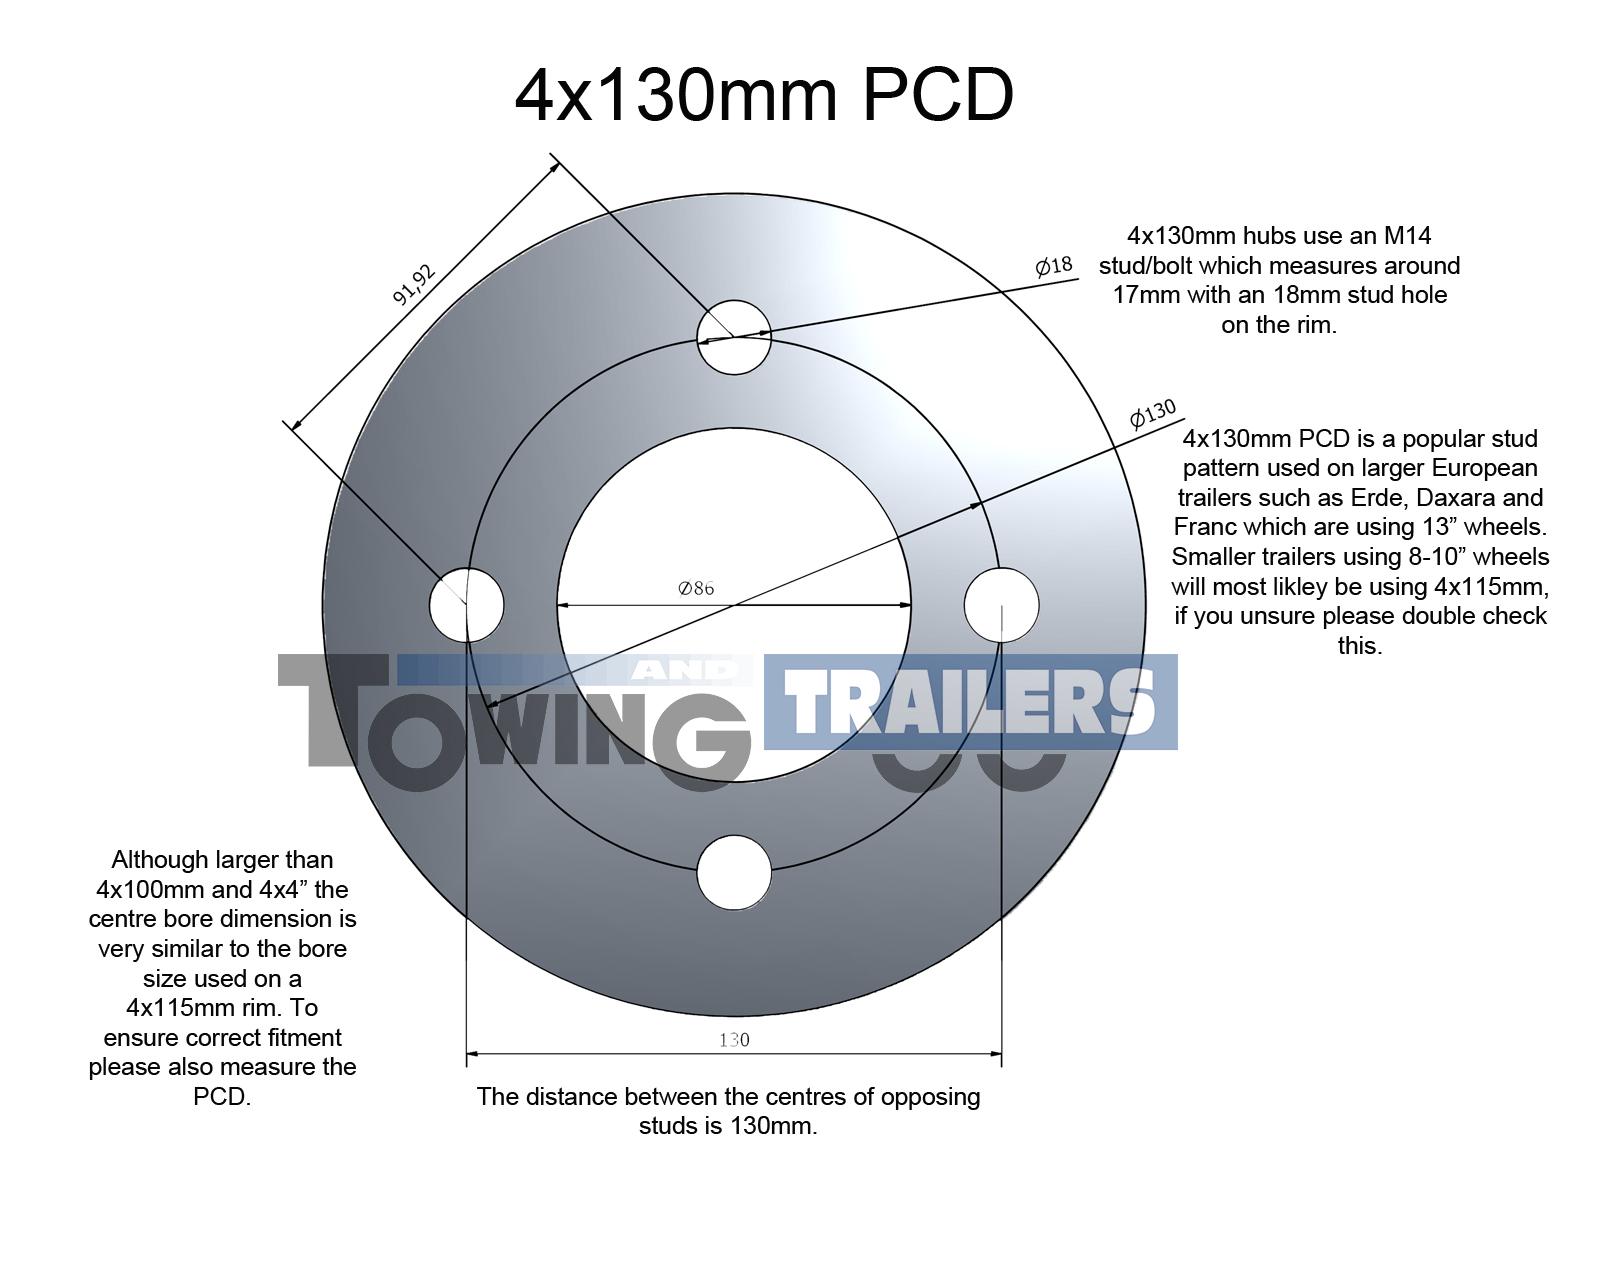 4x130mm PCD